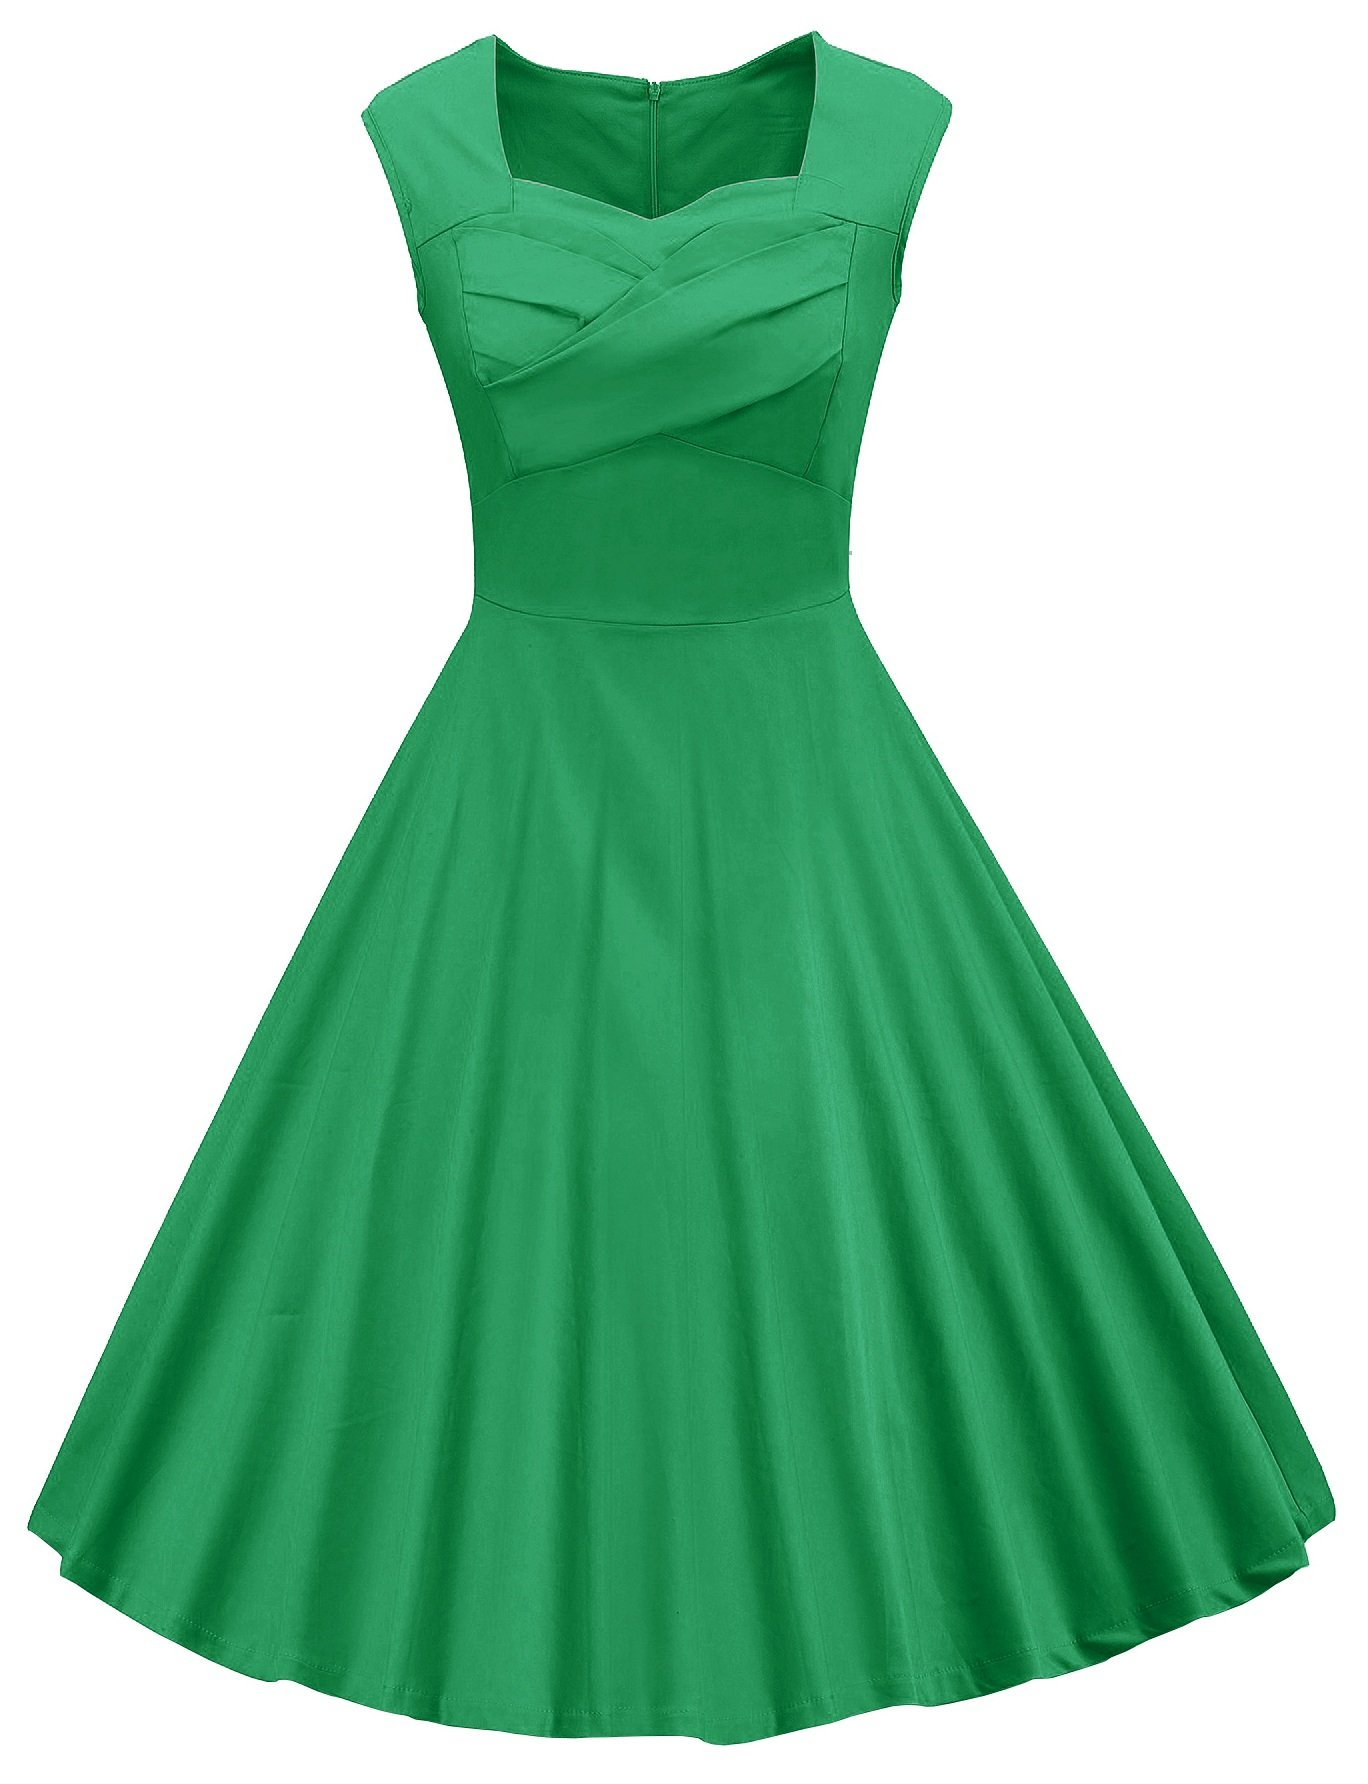 VOGVOG Women's 1950s Retro Vintage Cap Sleeve Party Swing Dress, Green, Medium